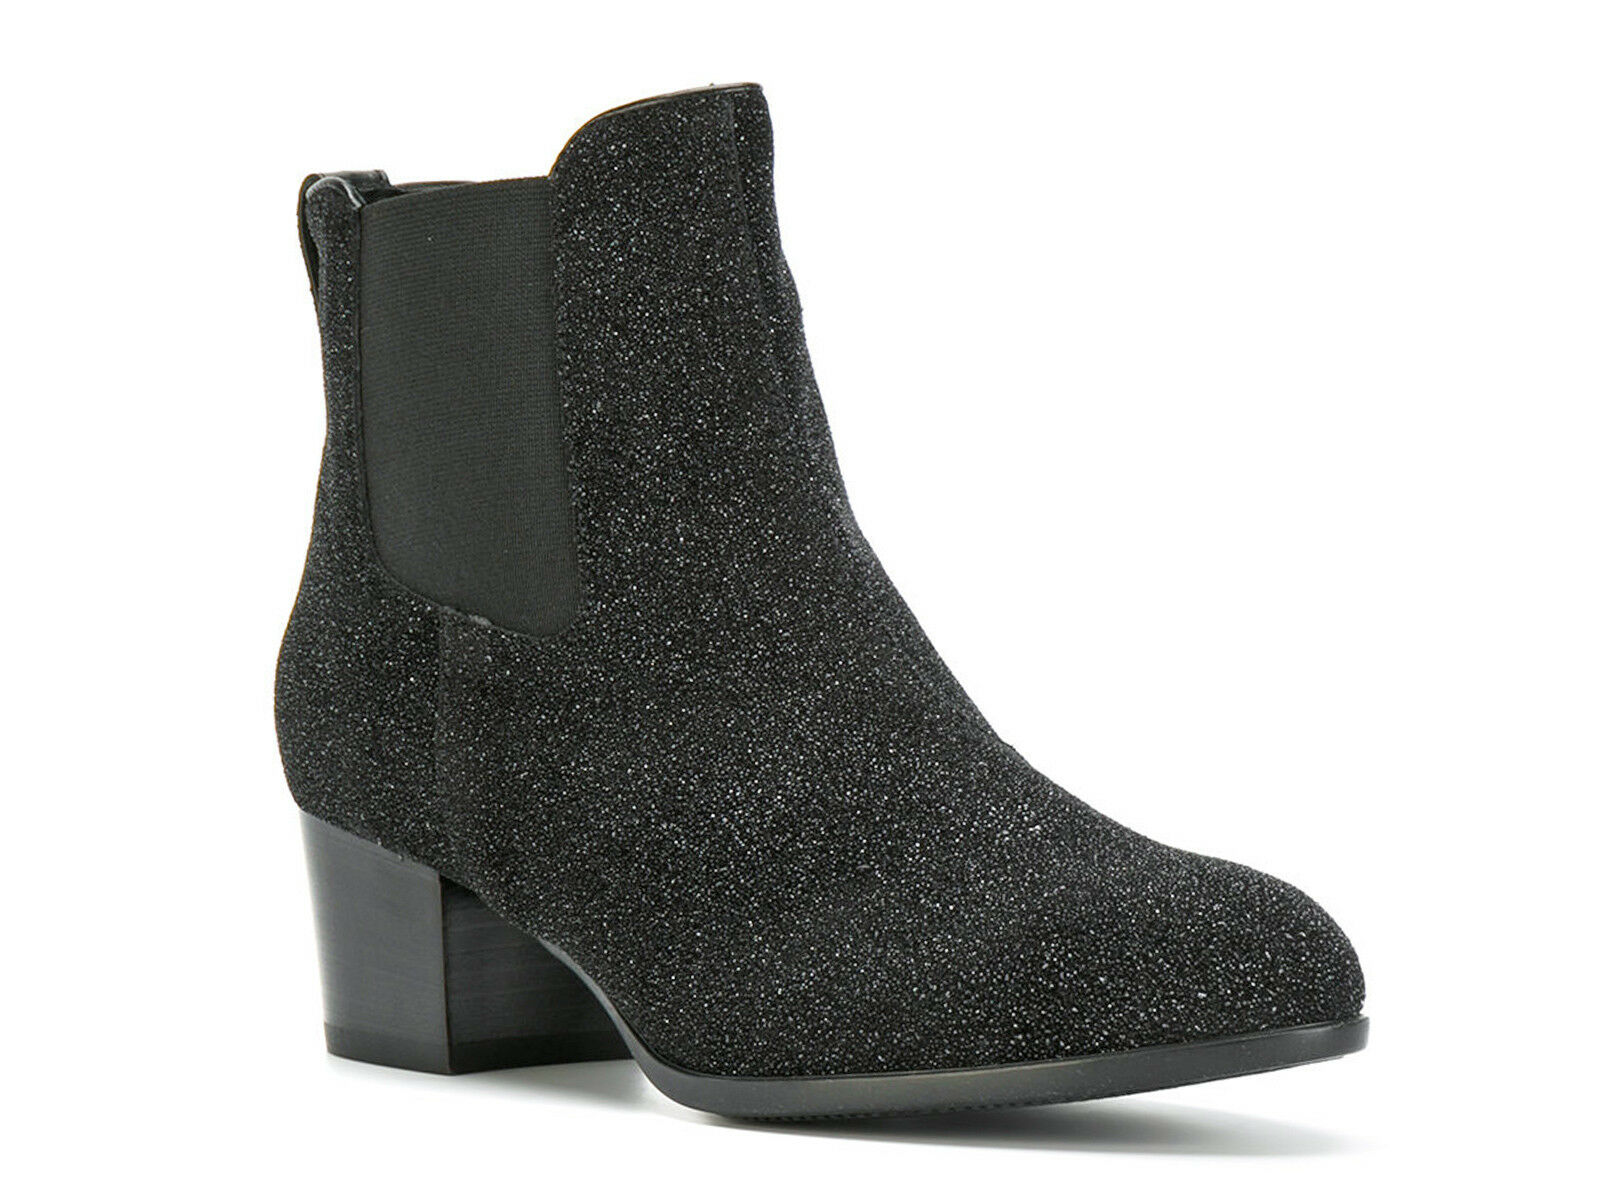 Hogan kitten heel ankle Stiefel in schwarz suede glitter Größe UK 5.5 - IT 38½